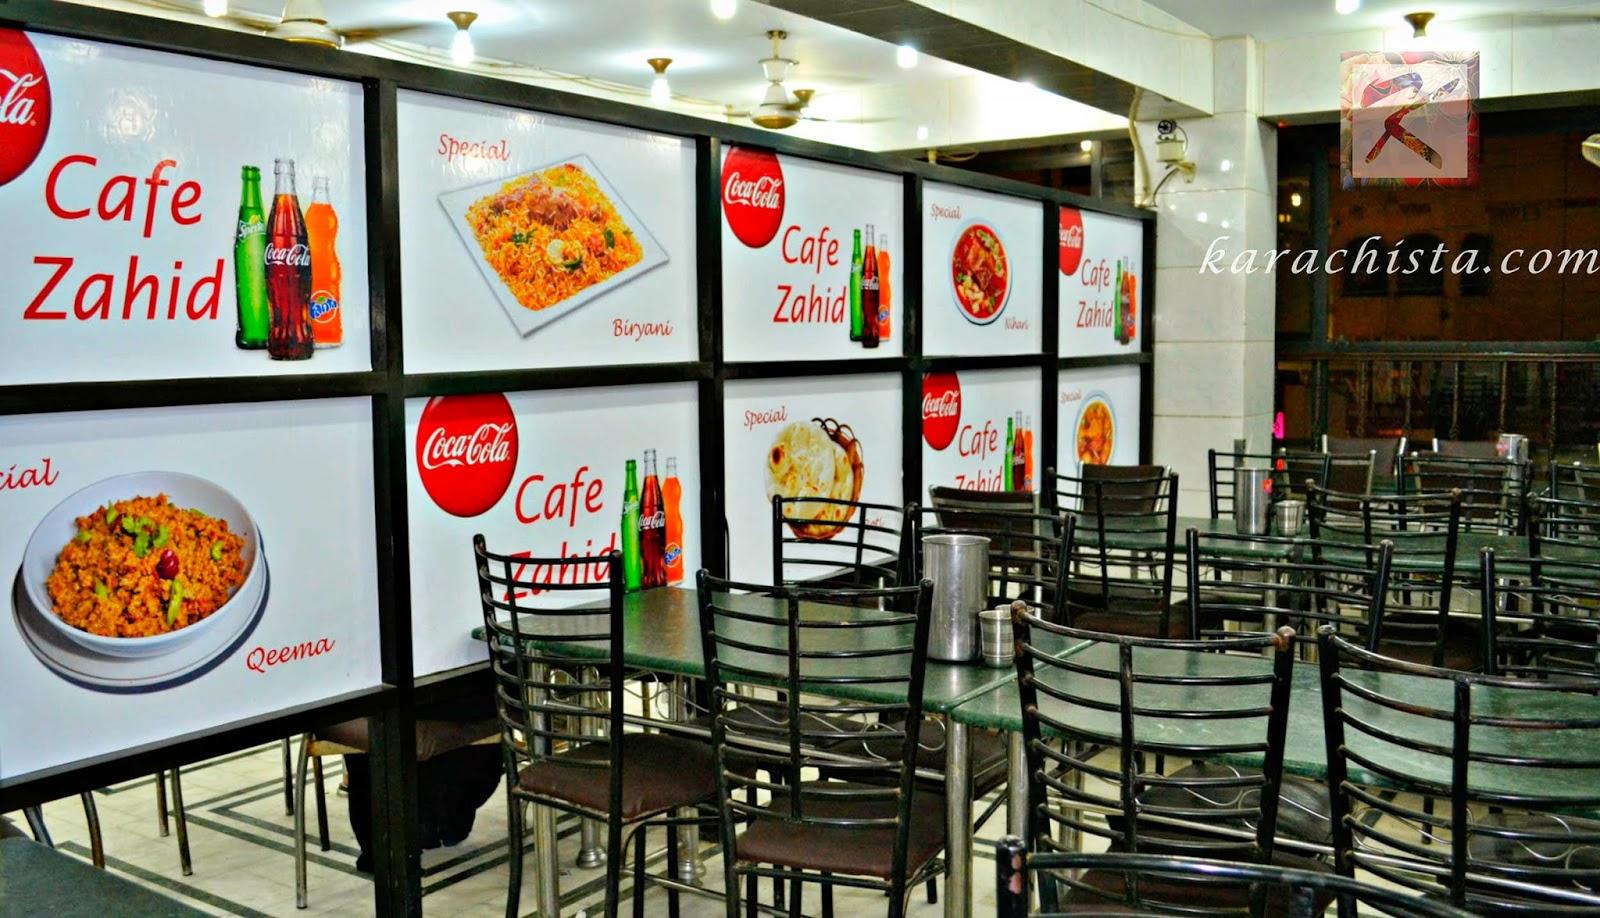 Cafeteria style seating at Zahid Nihari